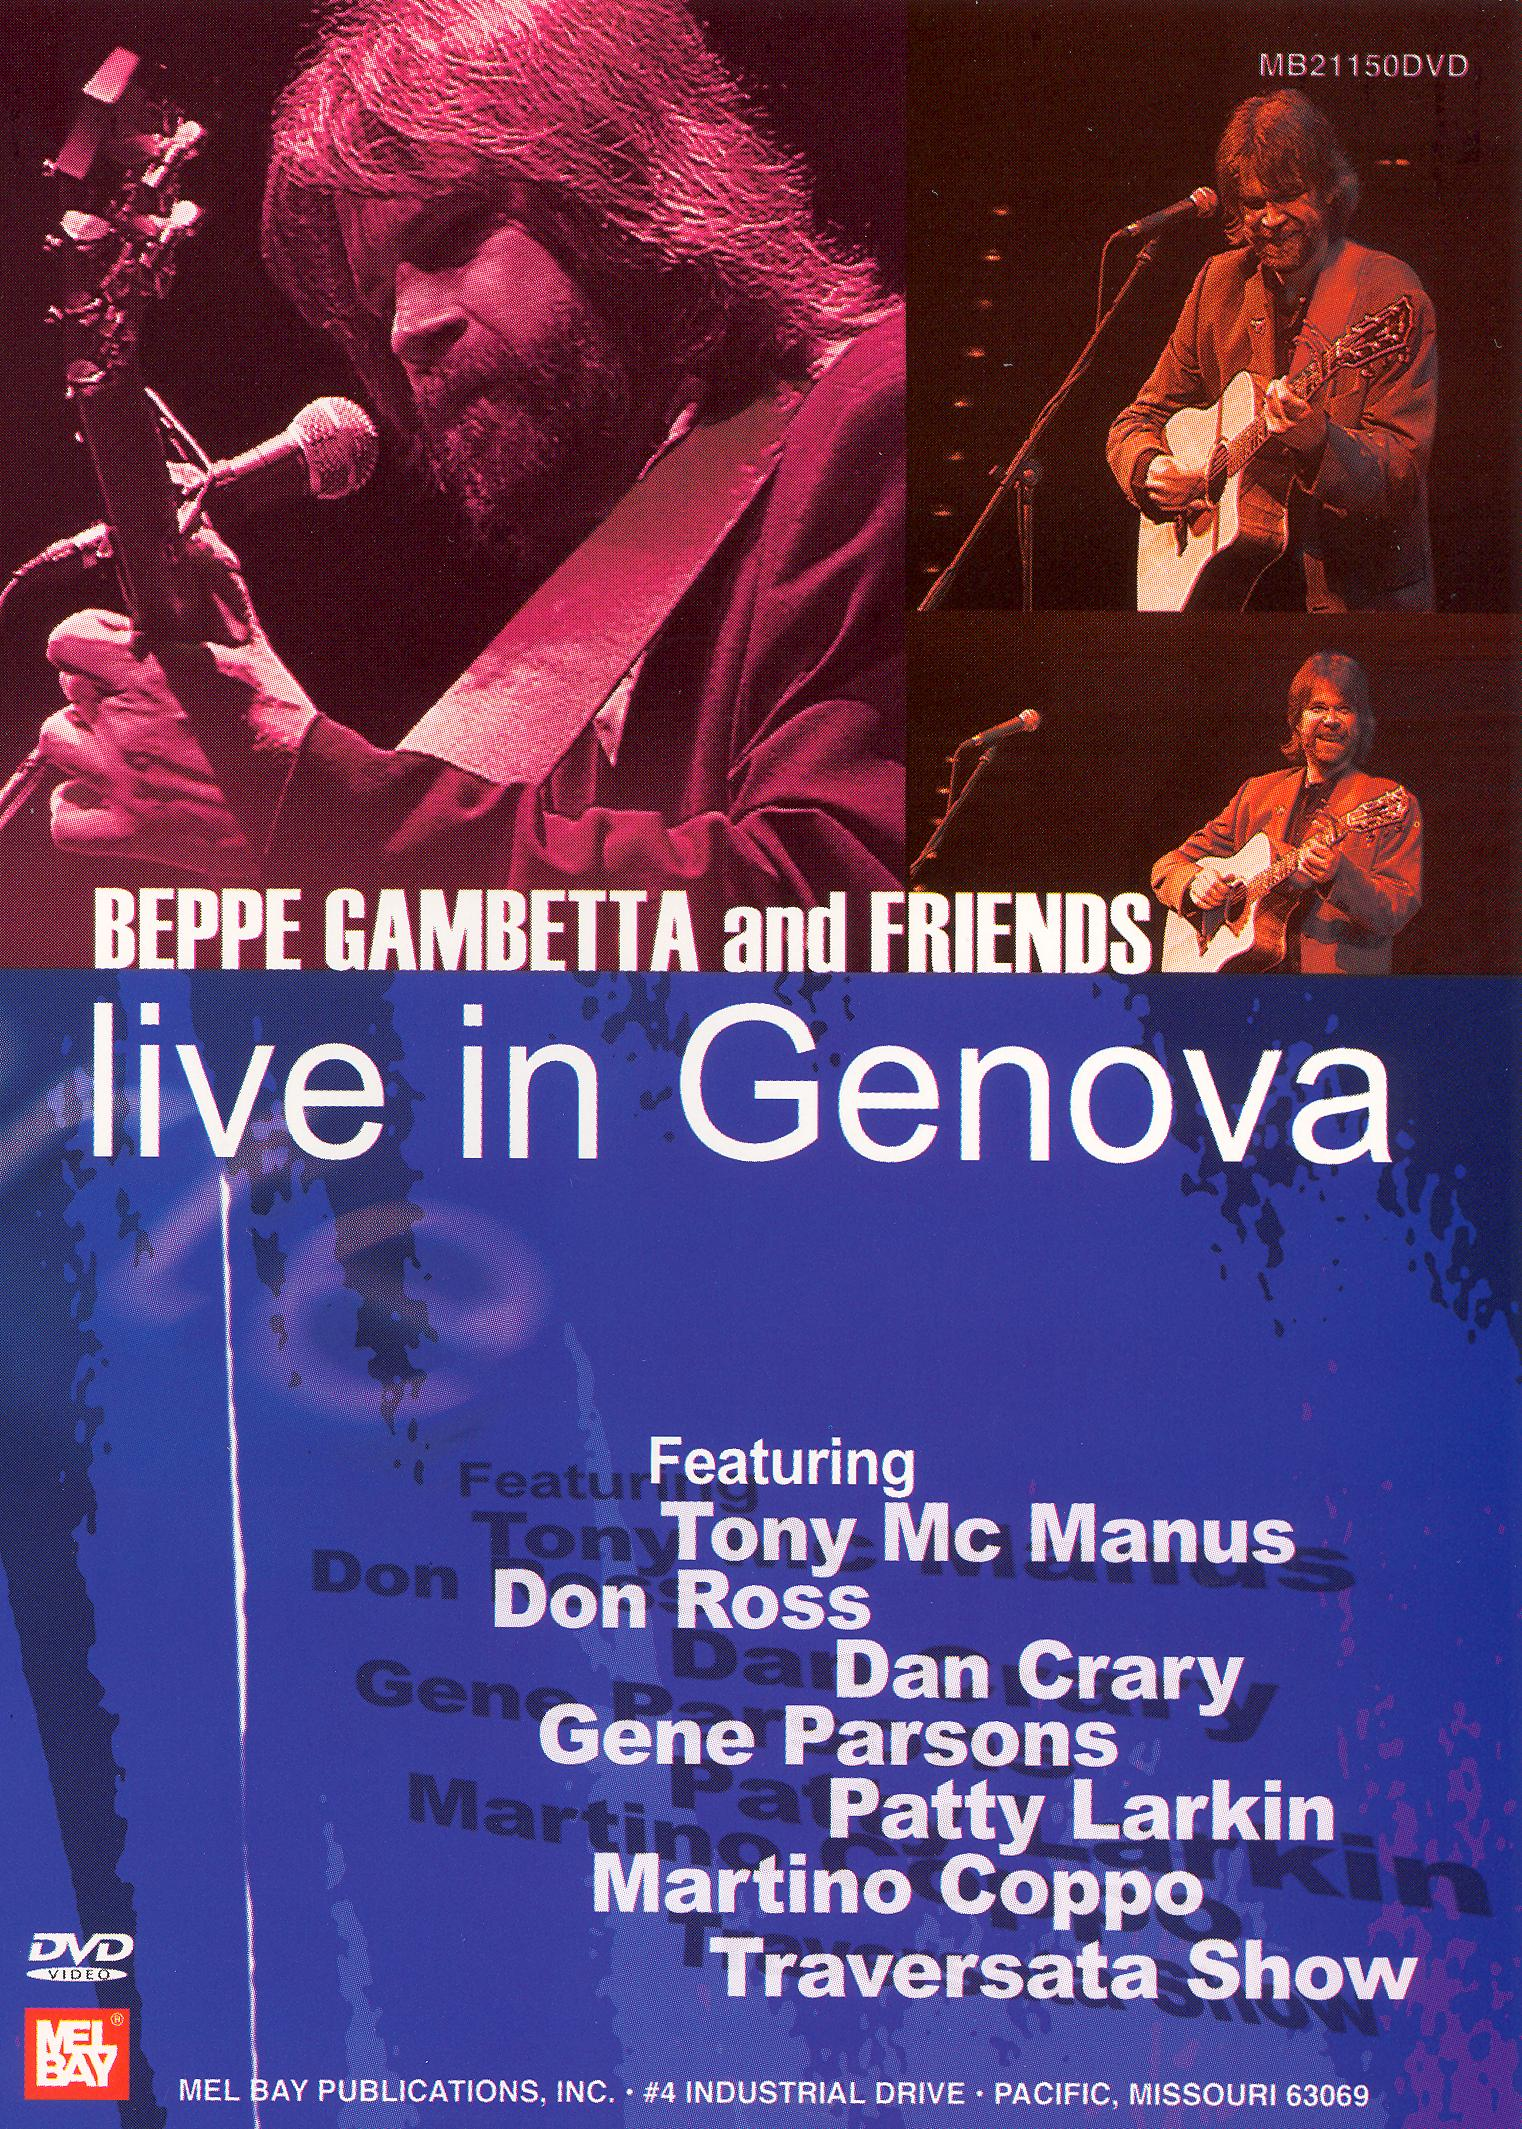 Beppe Gambetta and Friends: Live in Genova